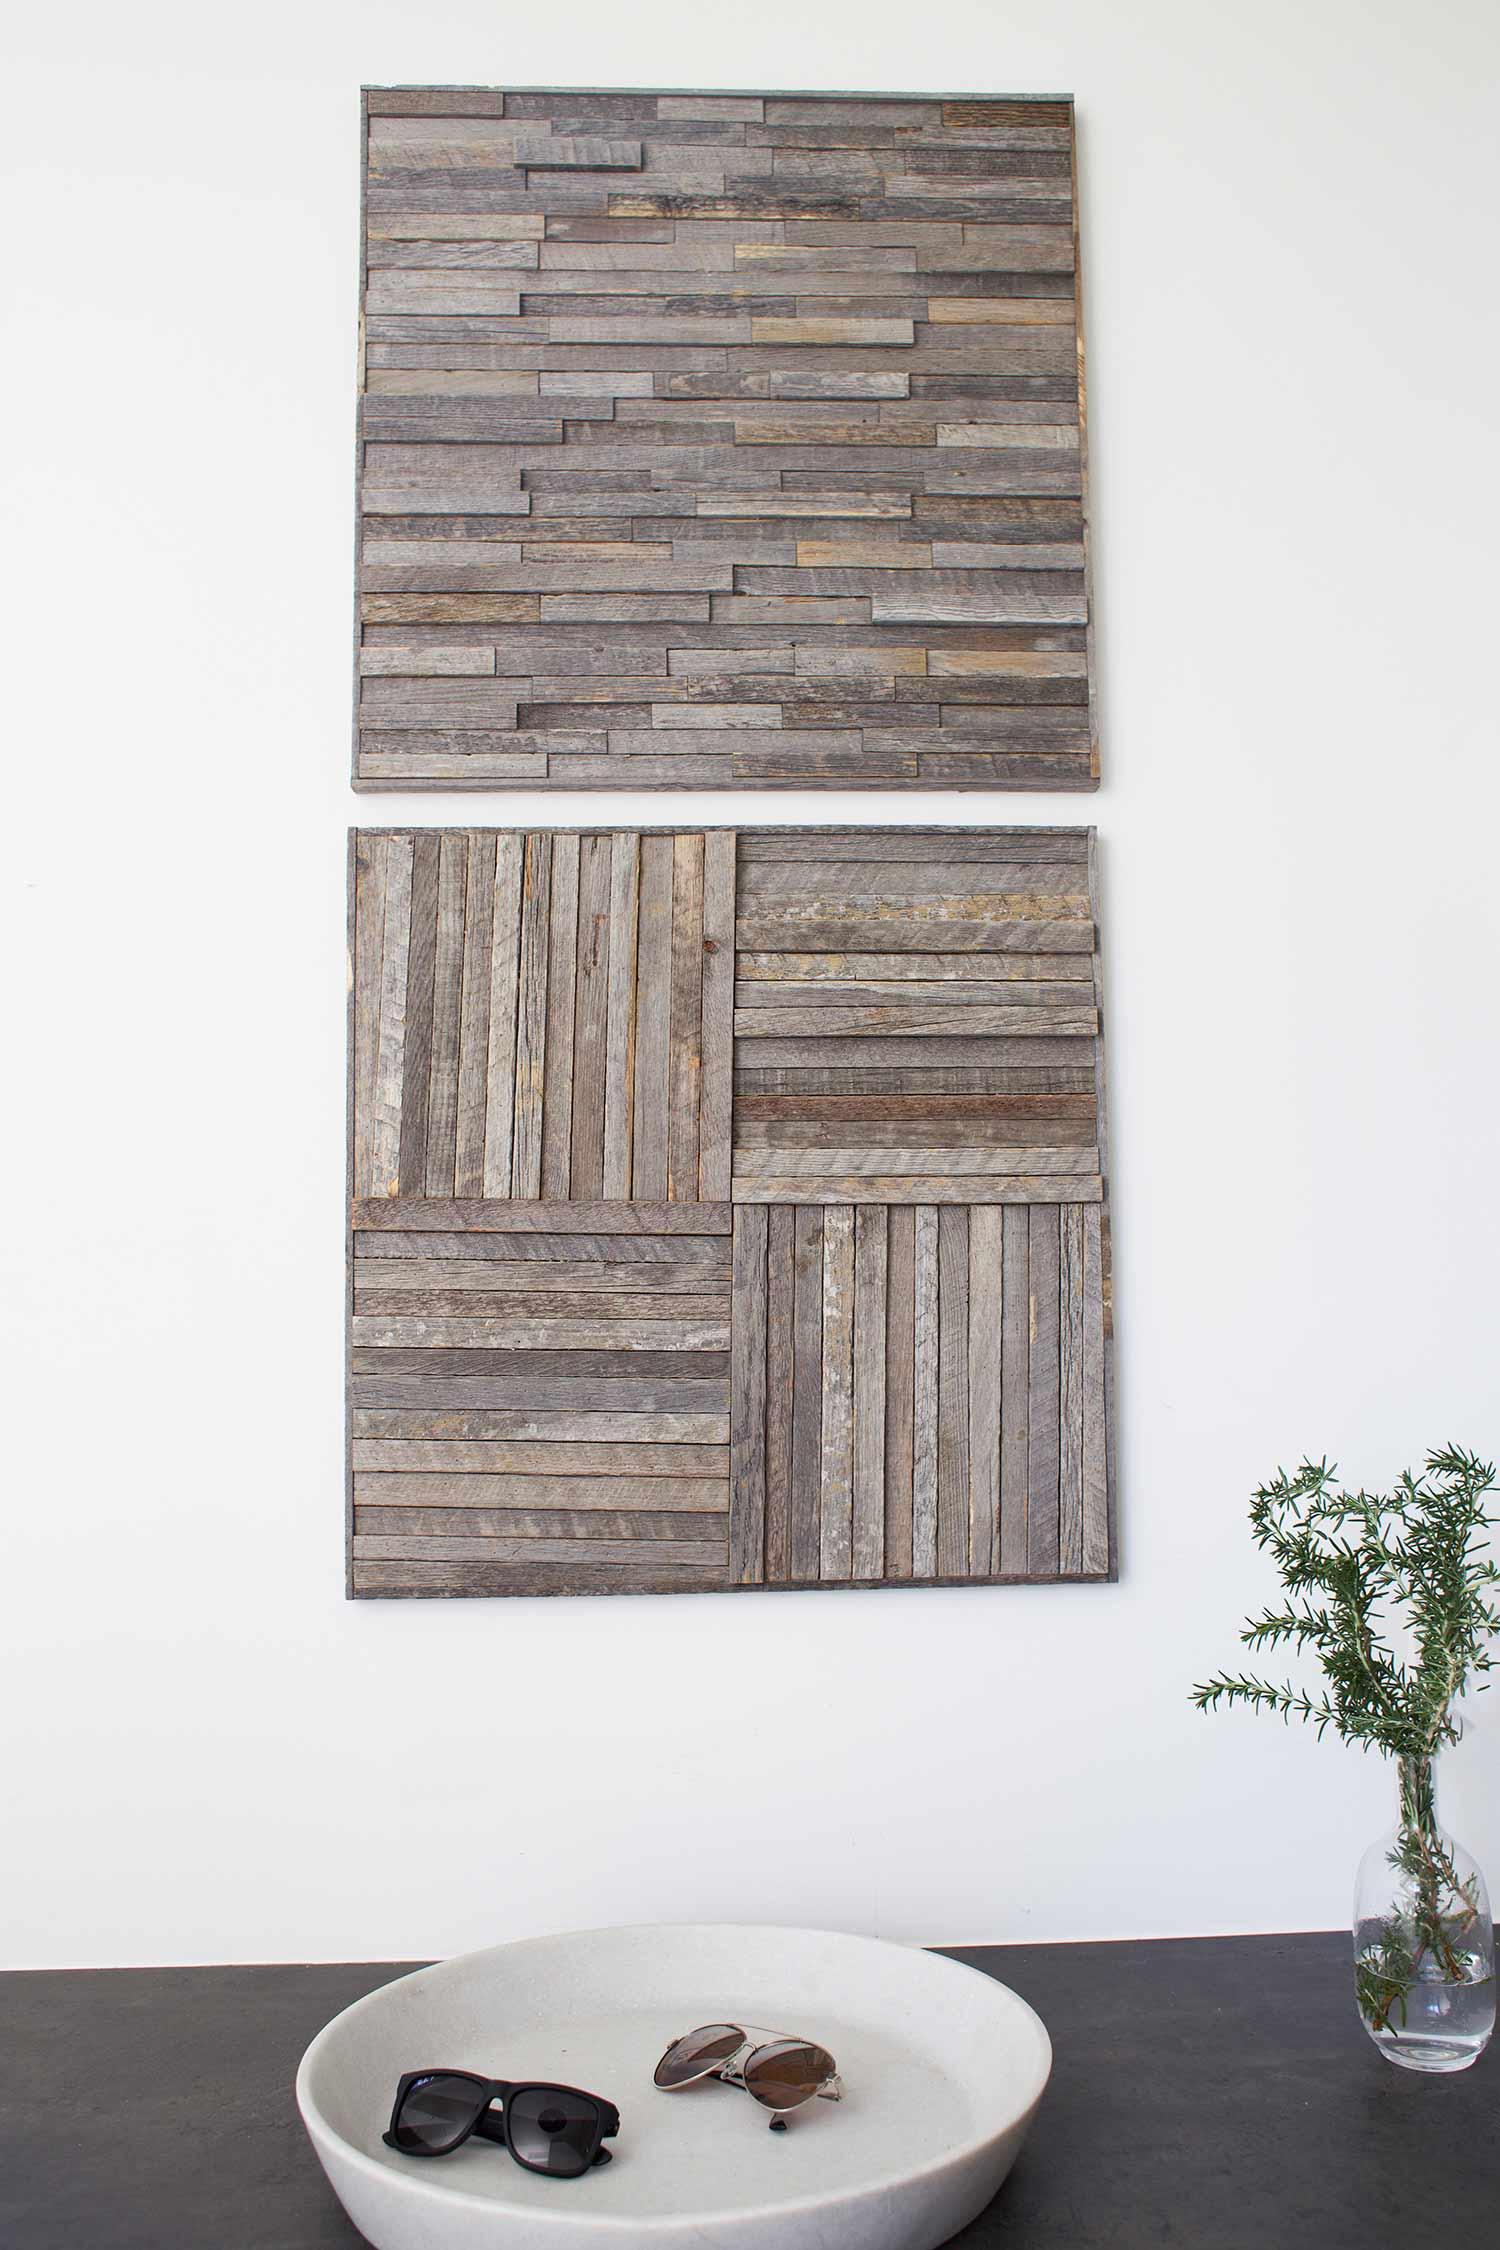 Stikwood wall art square panels